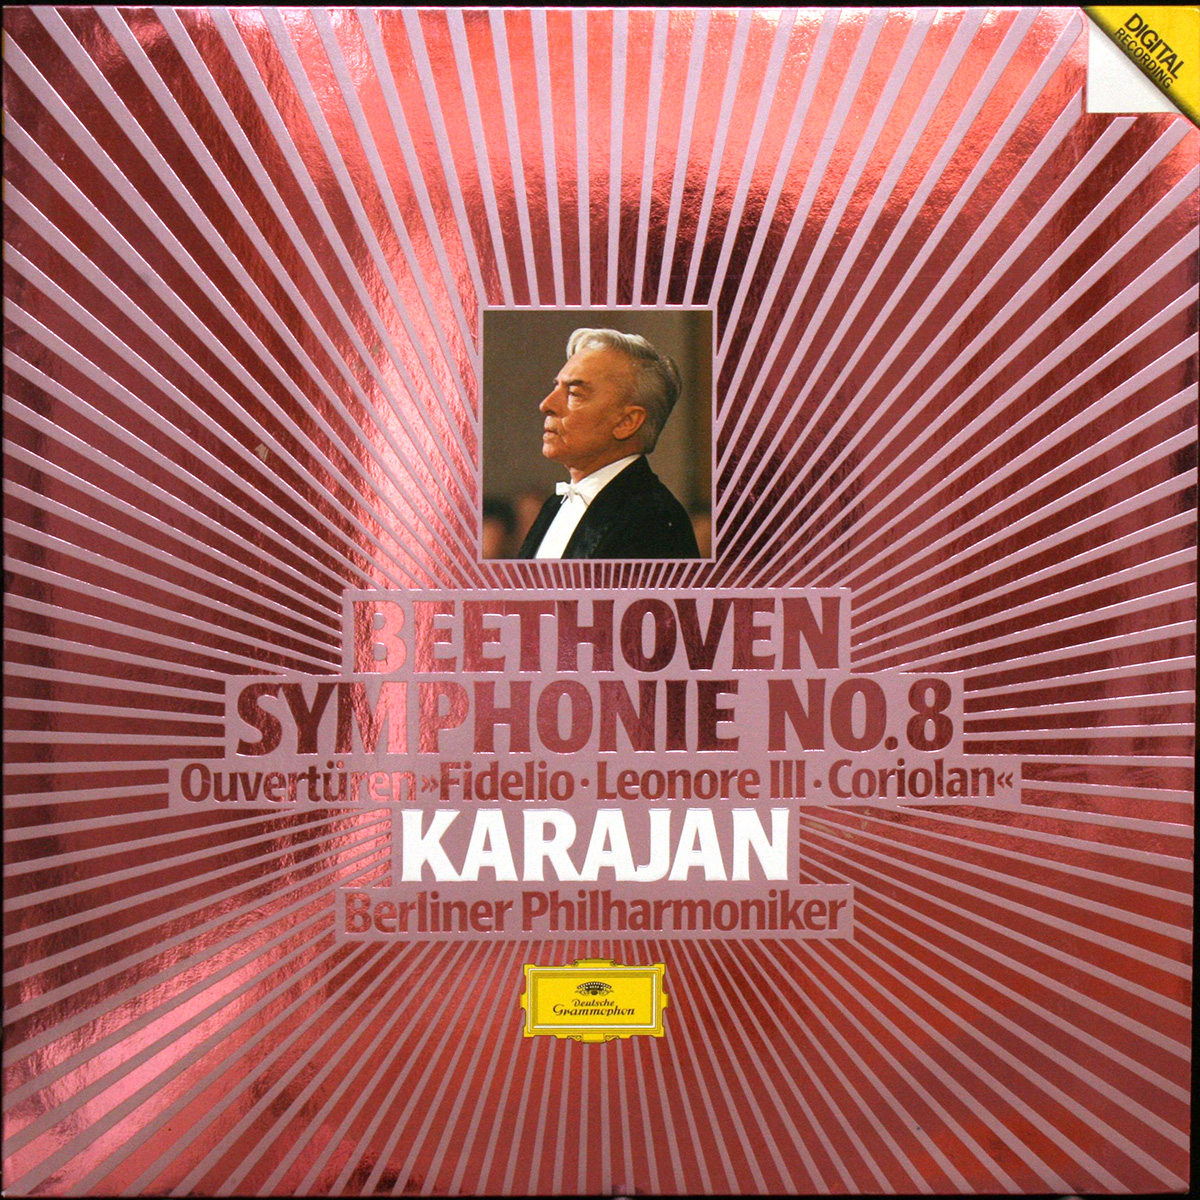 DGG 410 507 Beethoven Symphonie 8 Fidelio Coriolan Karajan DGG Digital Aufnahme